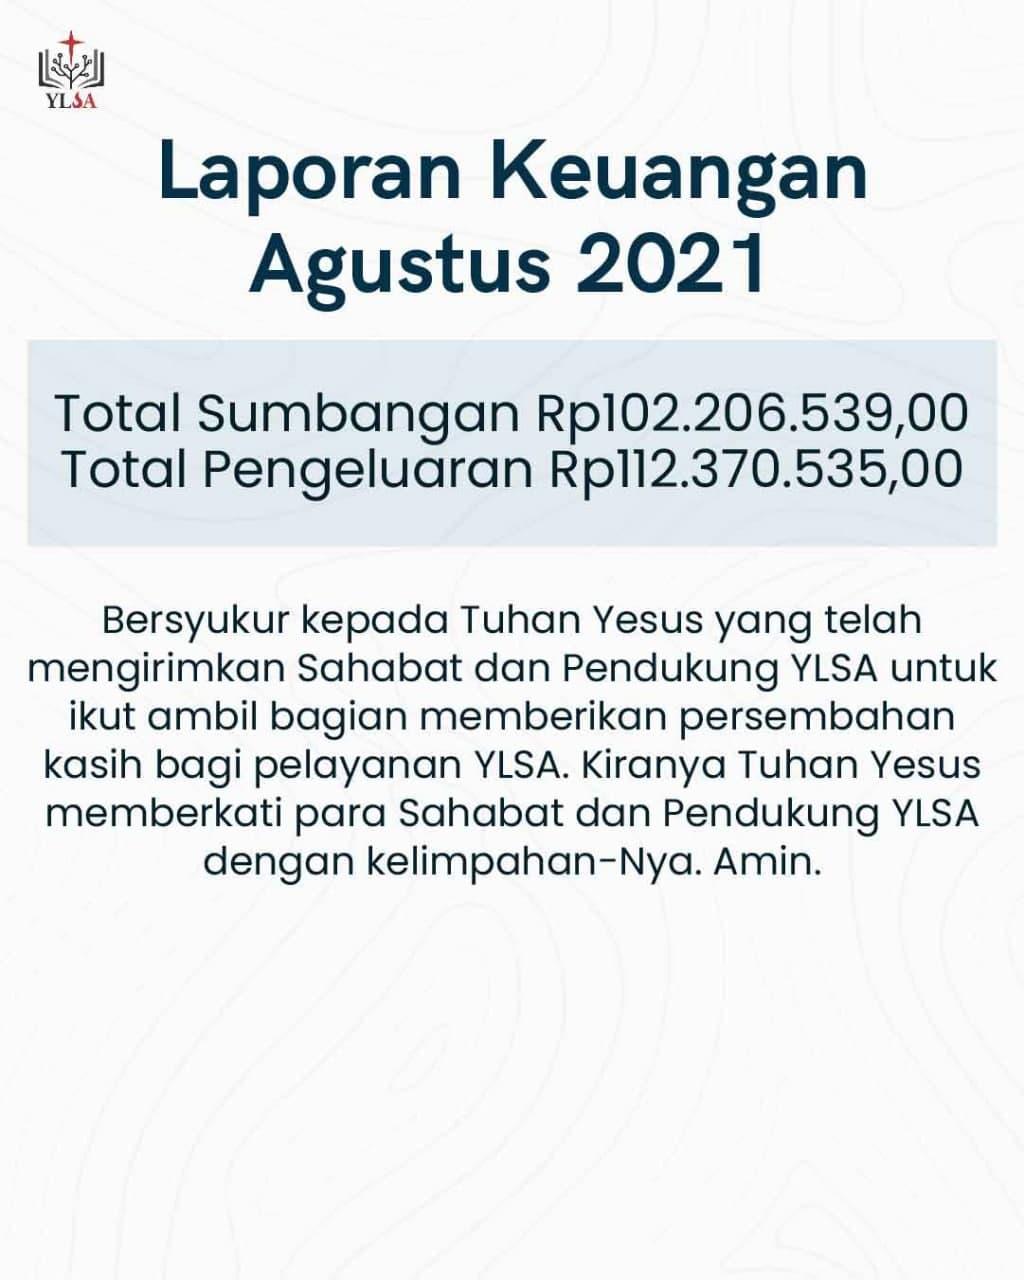 Laporan keuangan YLSA Agustus 2021.